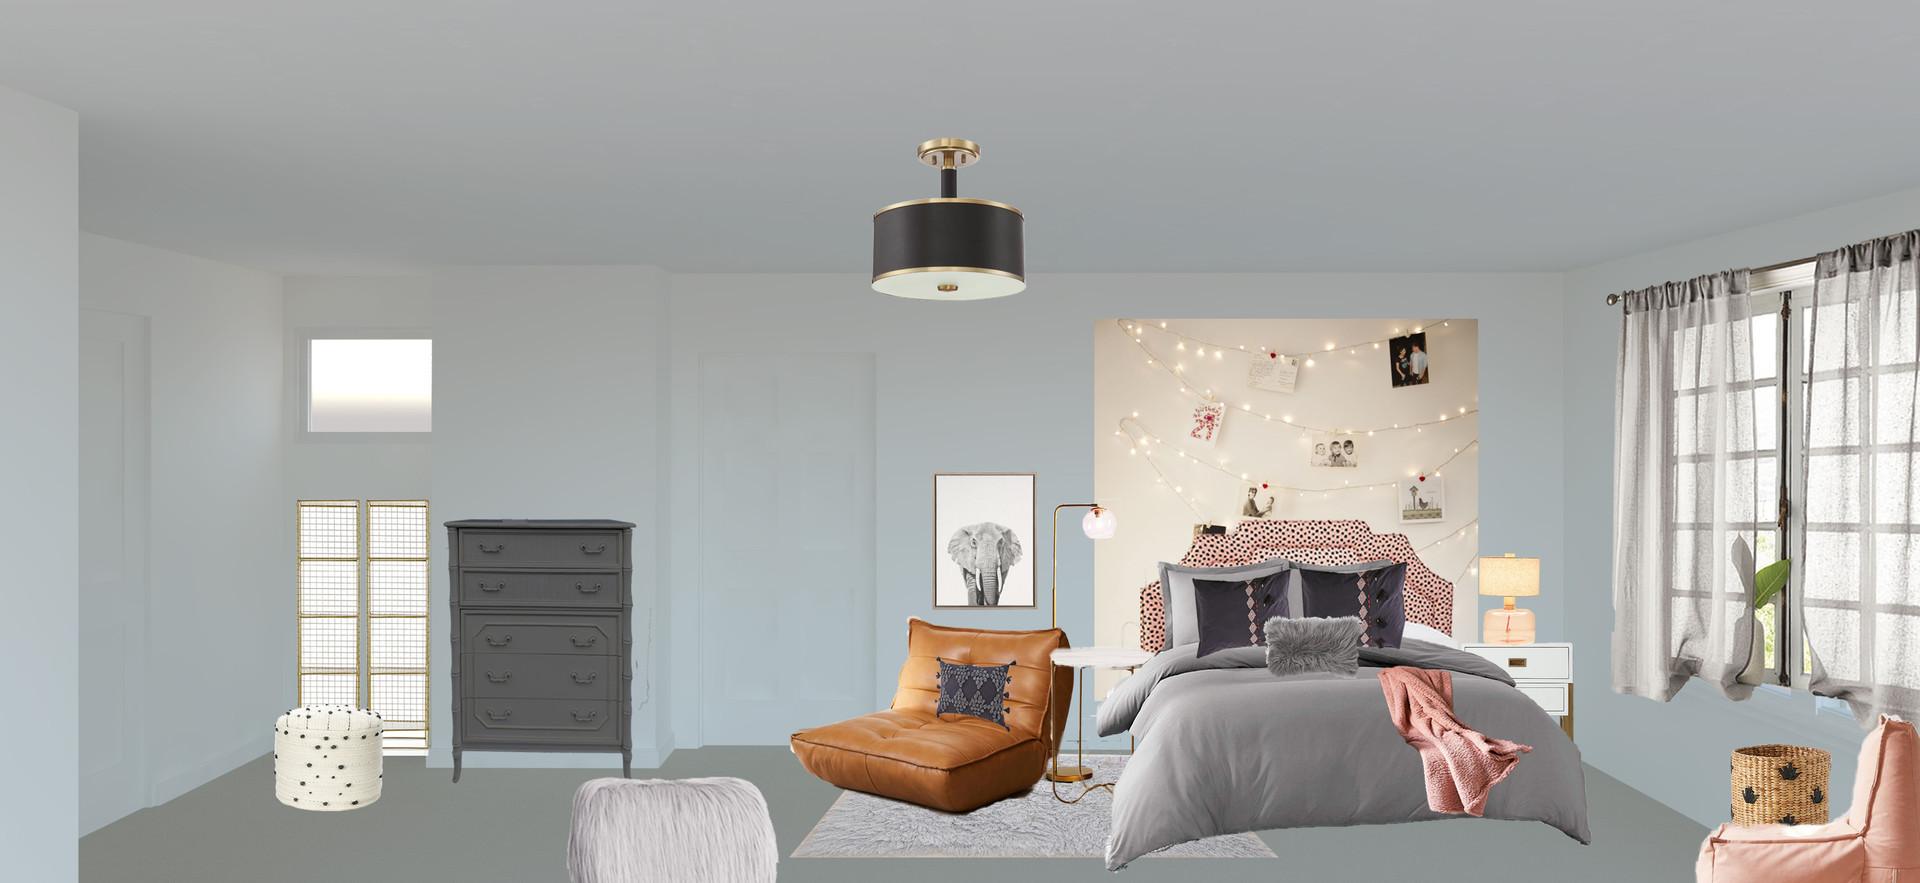 Bibi Bedroom Option 3.jpg